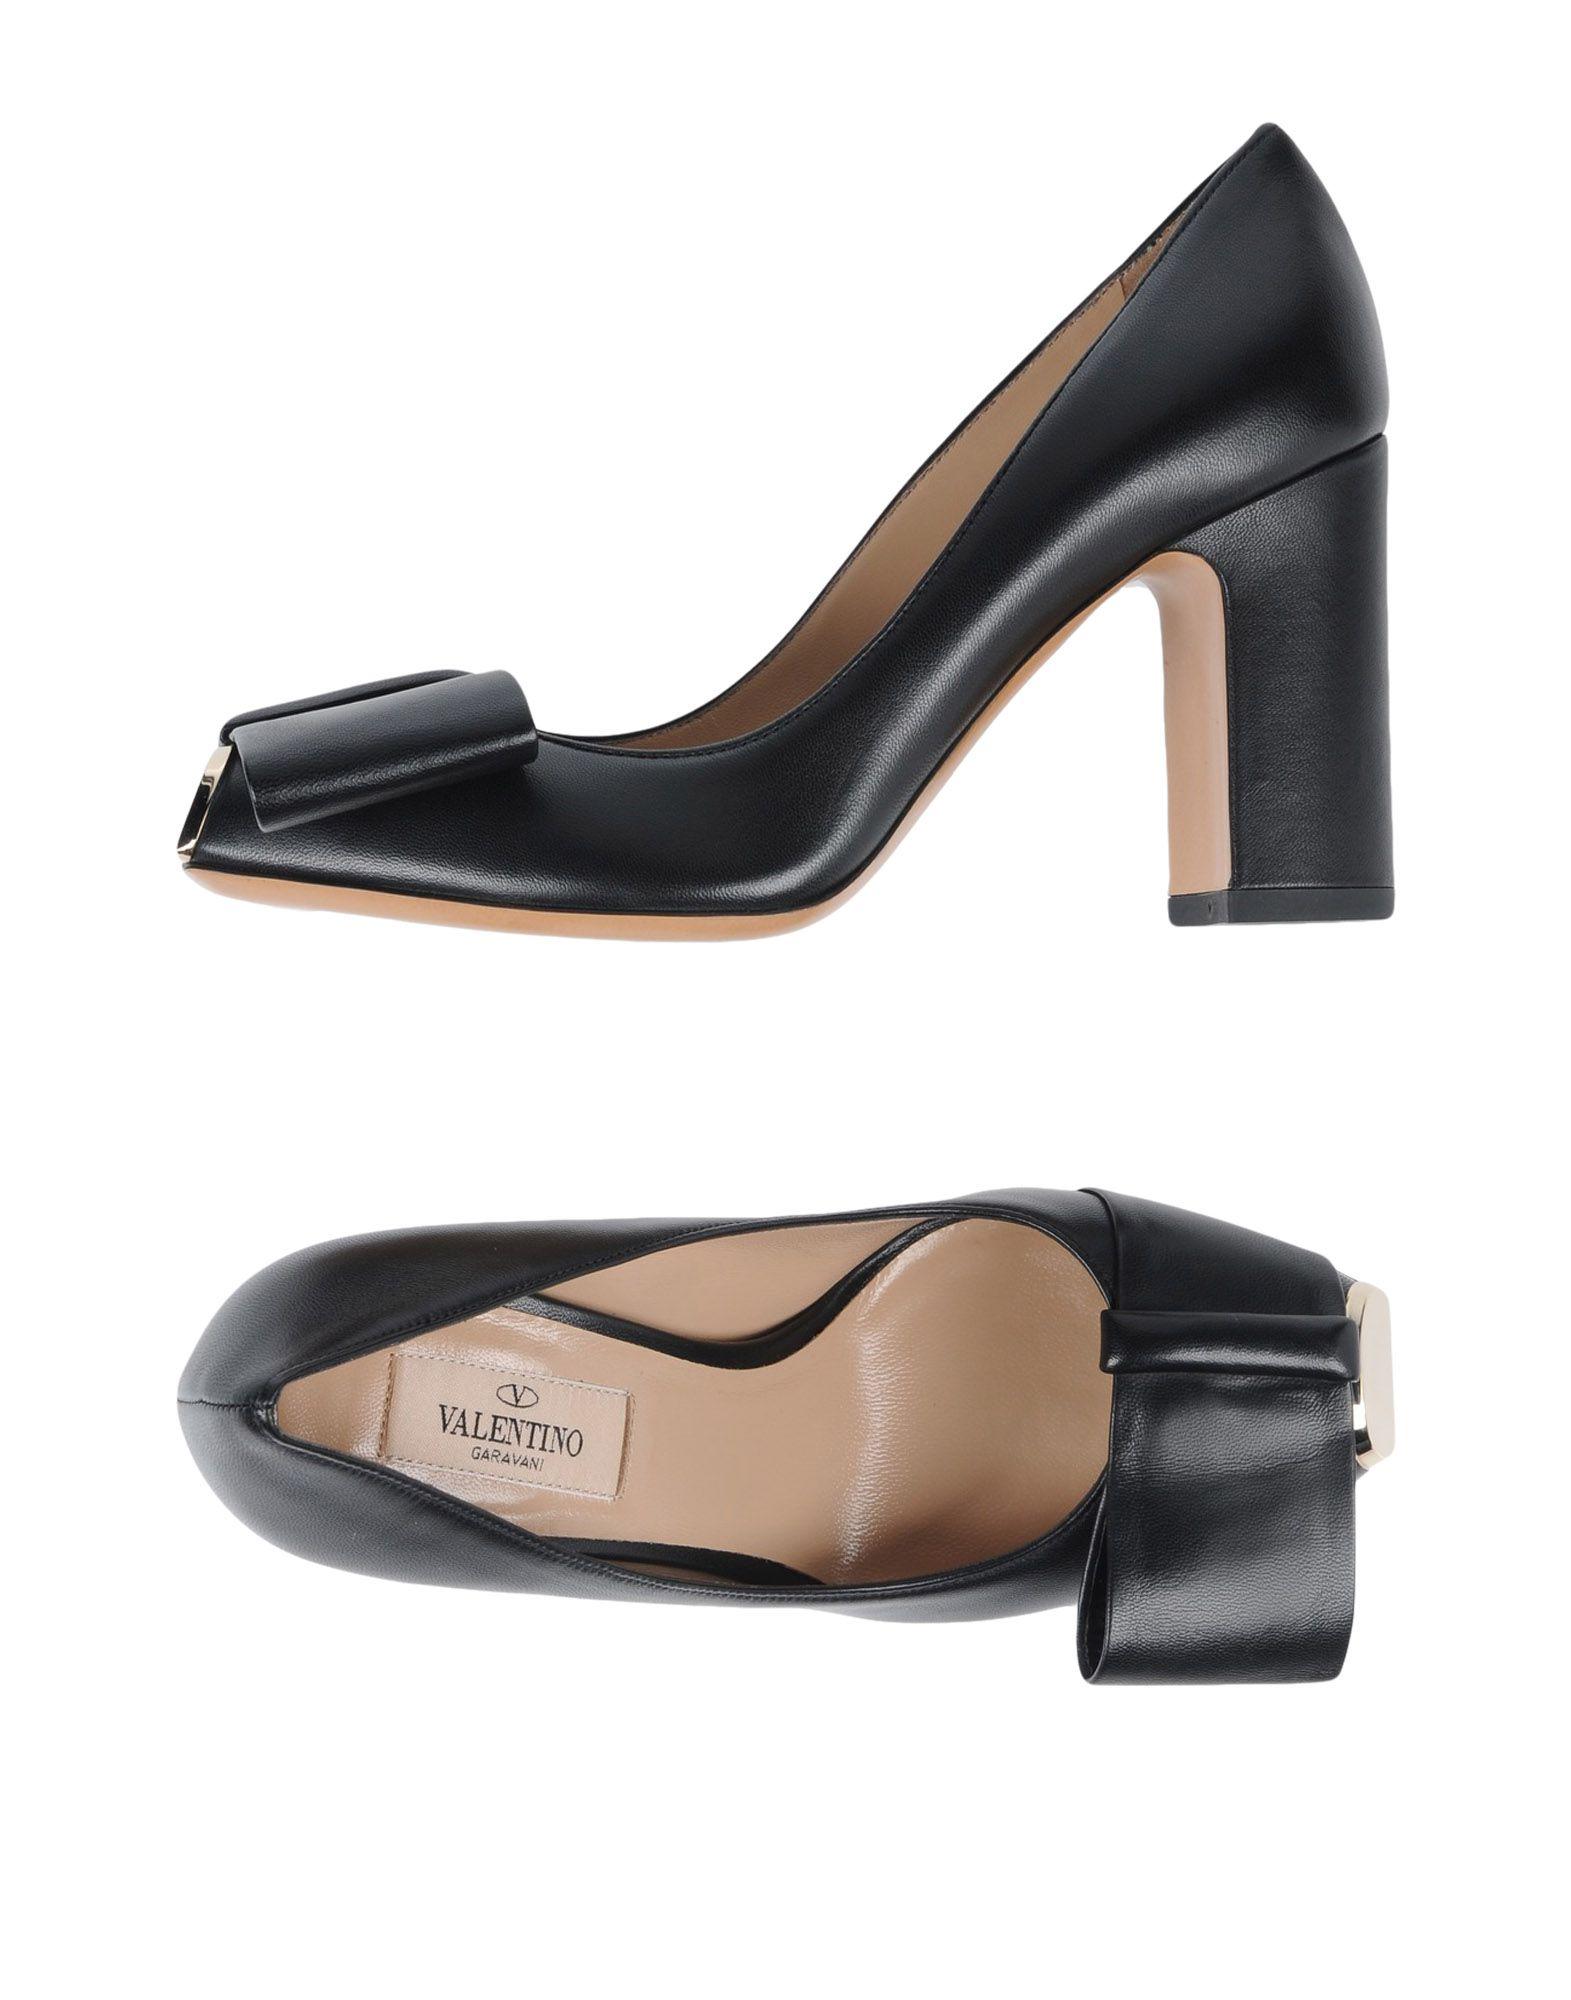 Escarpins Valentino Garavani Femme - Escarpins Valentino Garavani Noir Remise de marque